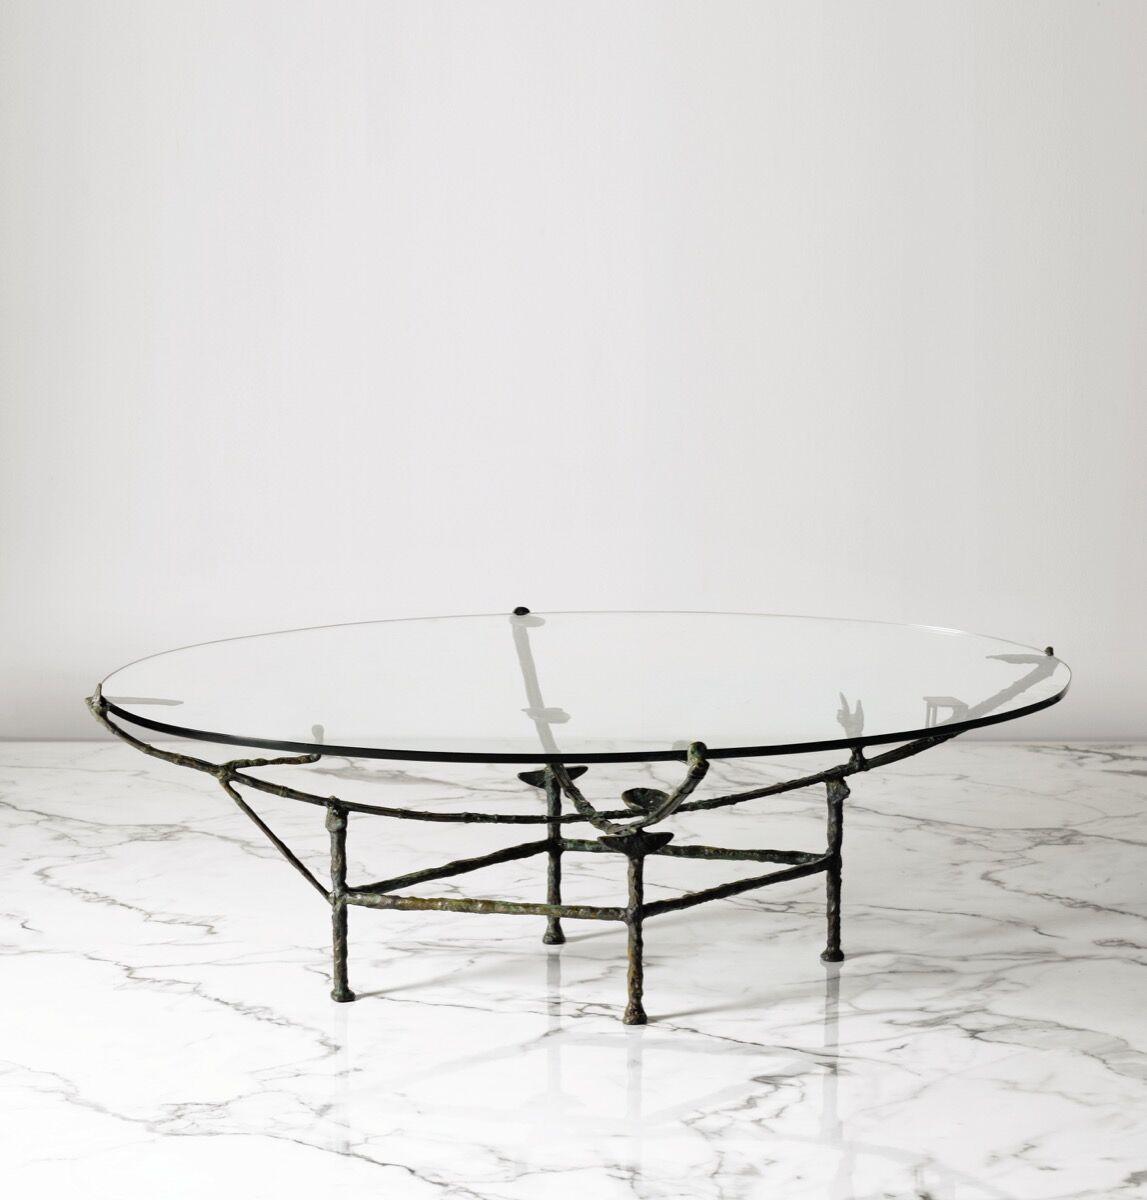 Diego Giacometti, Table Carcasse à la chauve-souris, circa 1970. Image courtesy of Sotheby's – Art Digital Studio.